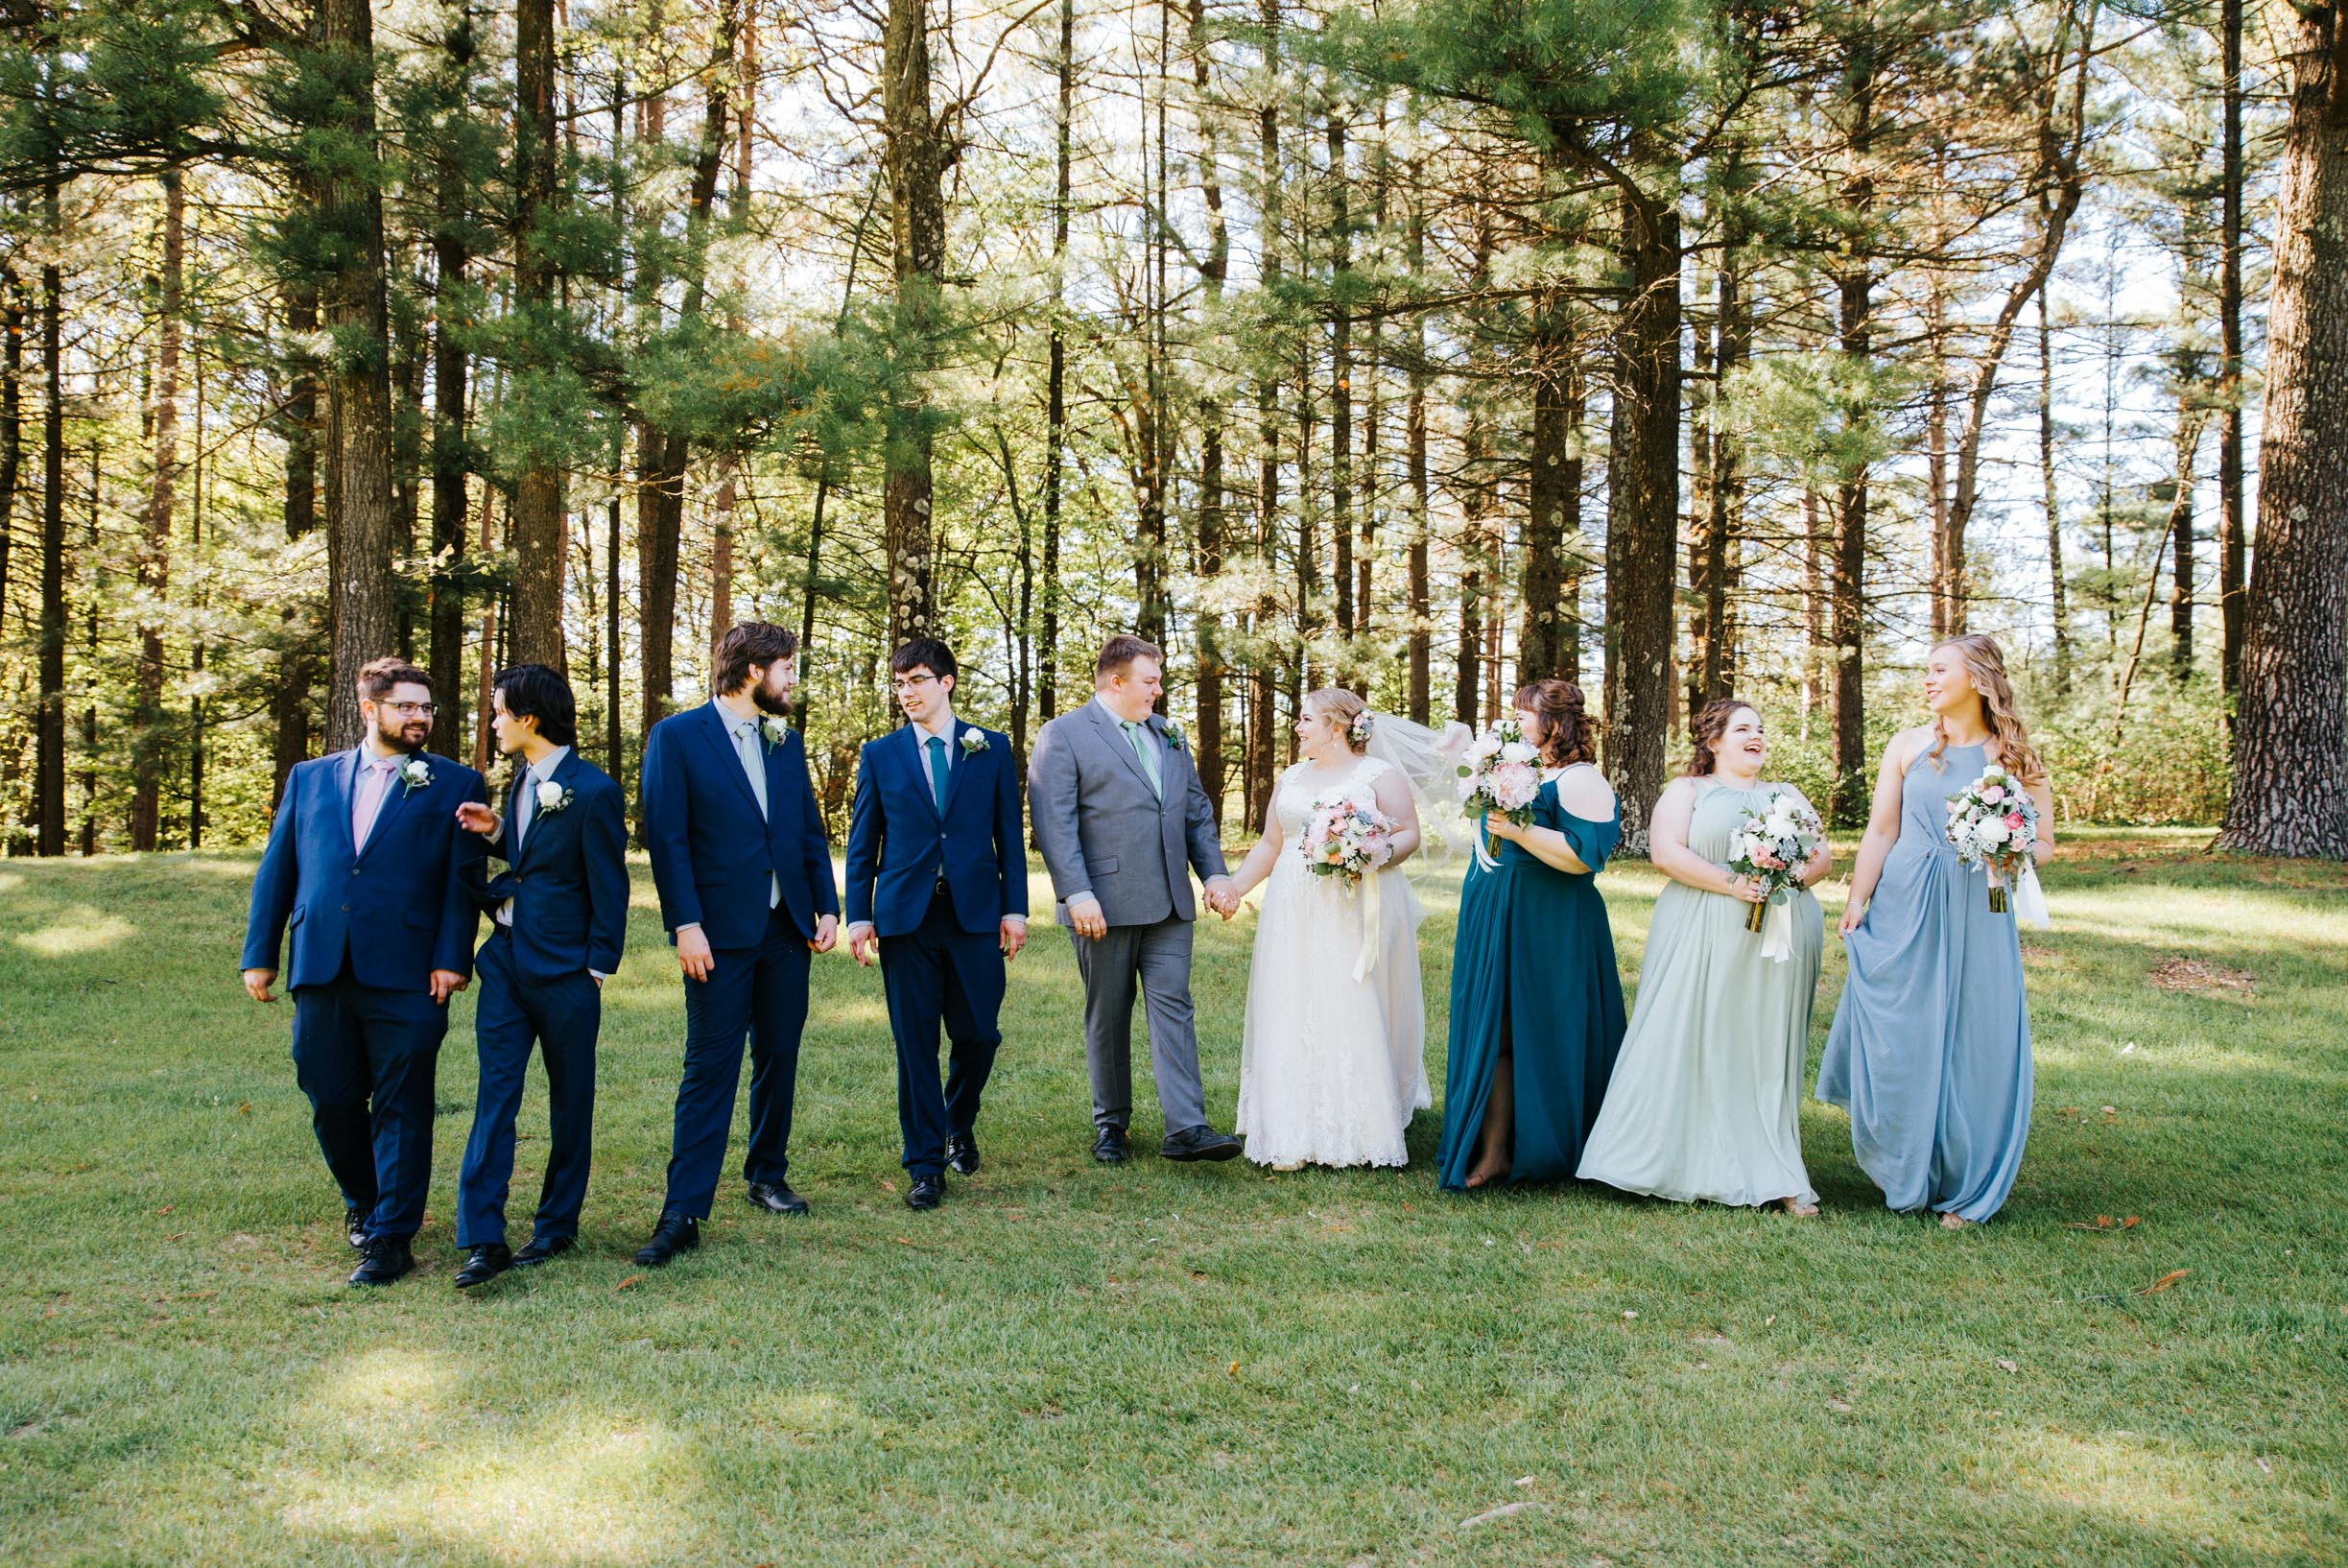 Hannah_Brandon_Wisconsin_Wedding_Party_Portraits-27.jpg